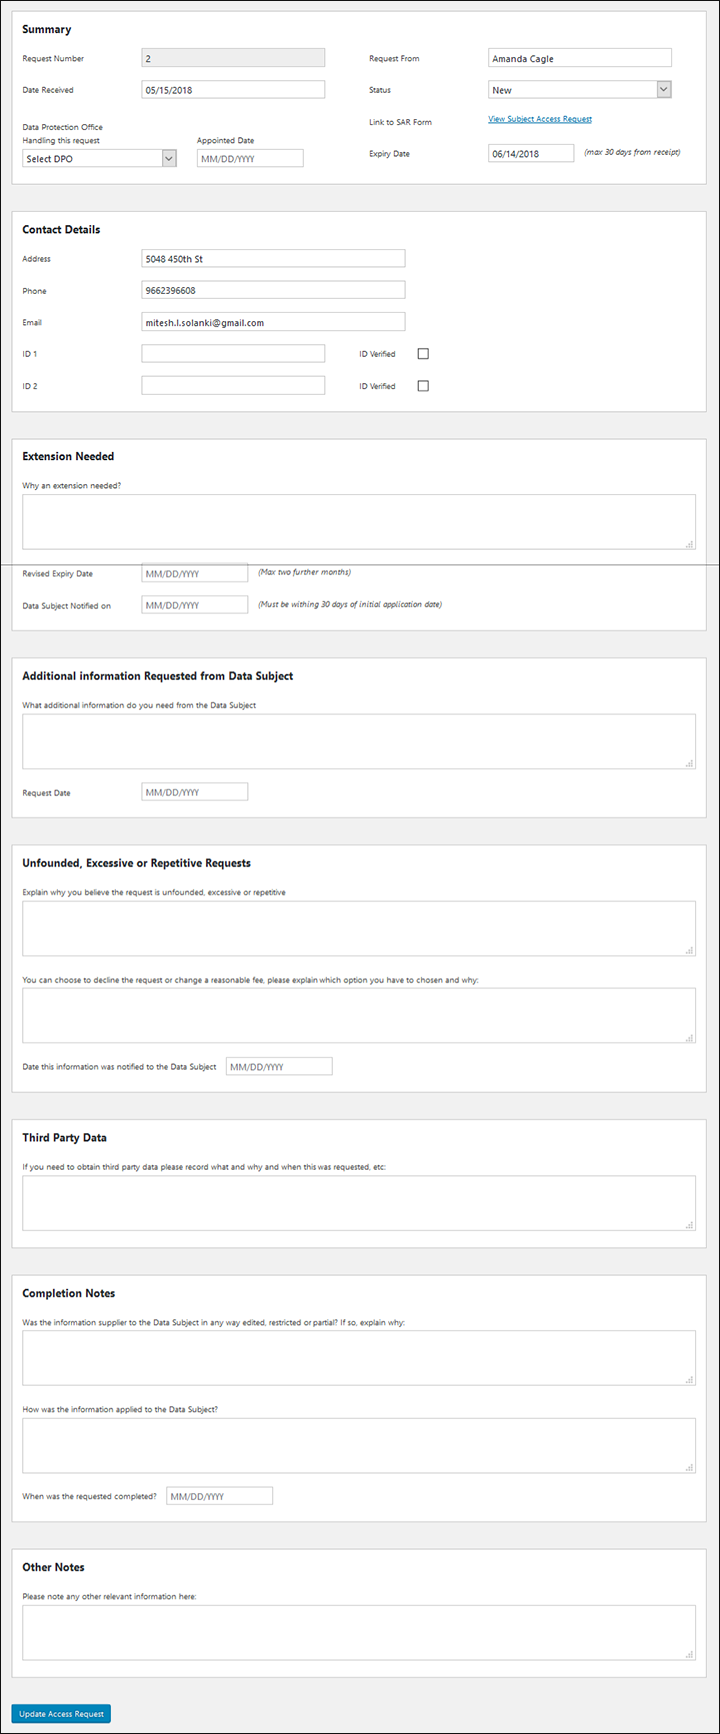 WP-HR GDPR Subject Access Request Register Details